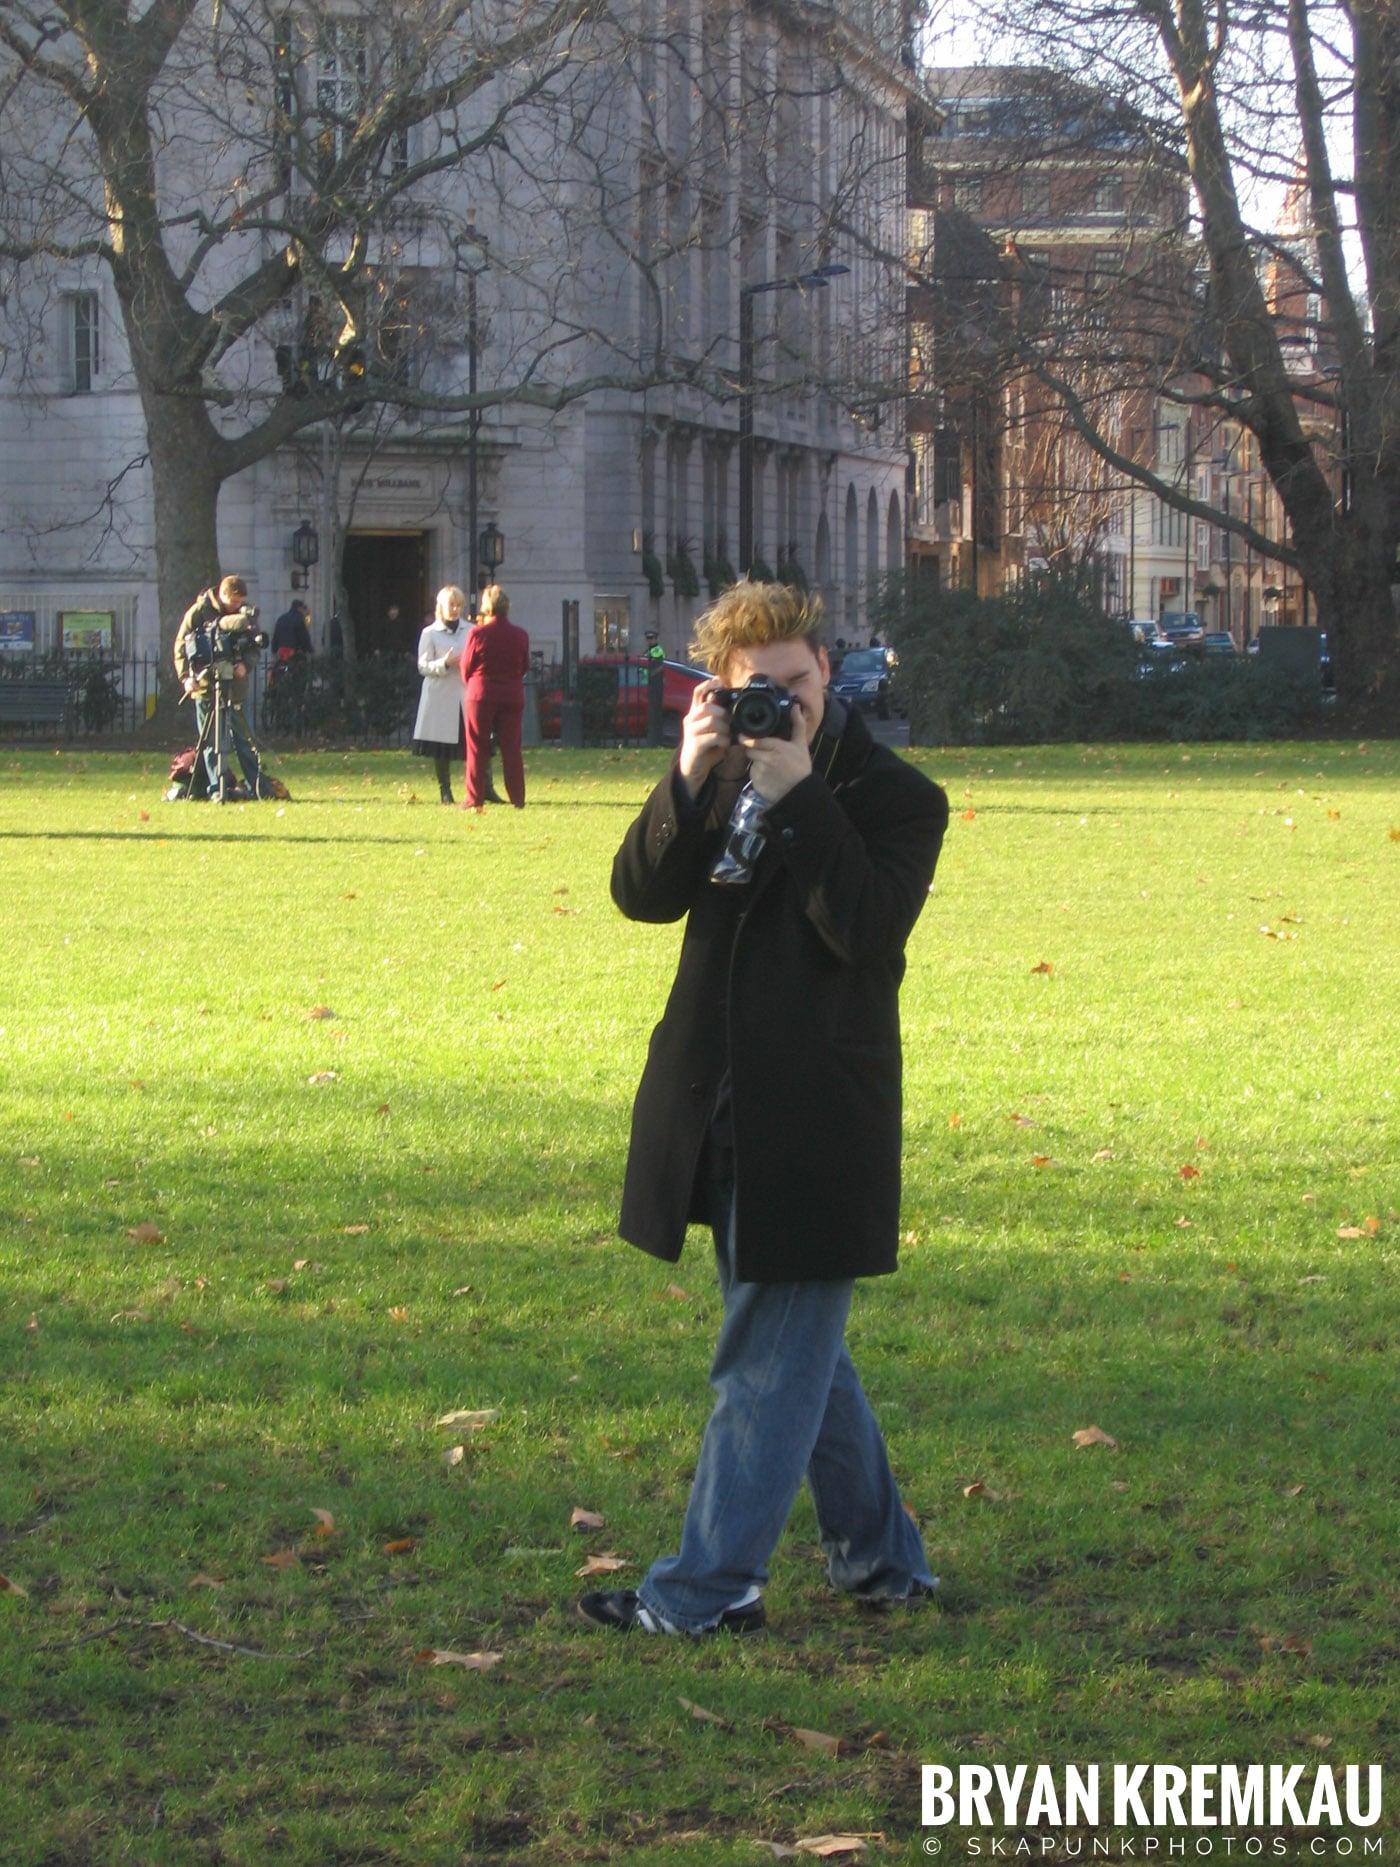 London, England - Day 4 - 12.19.05 (1)